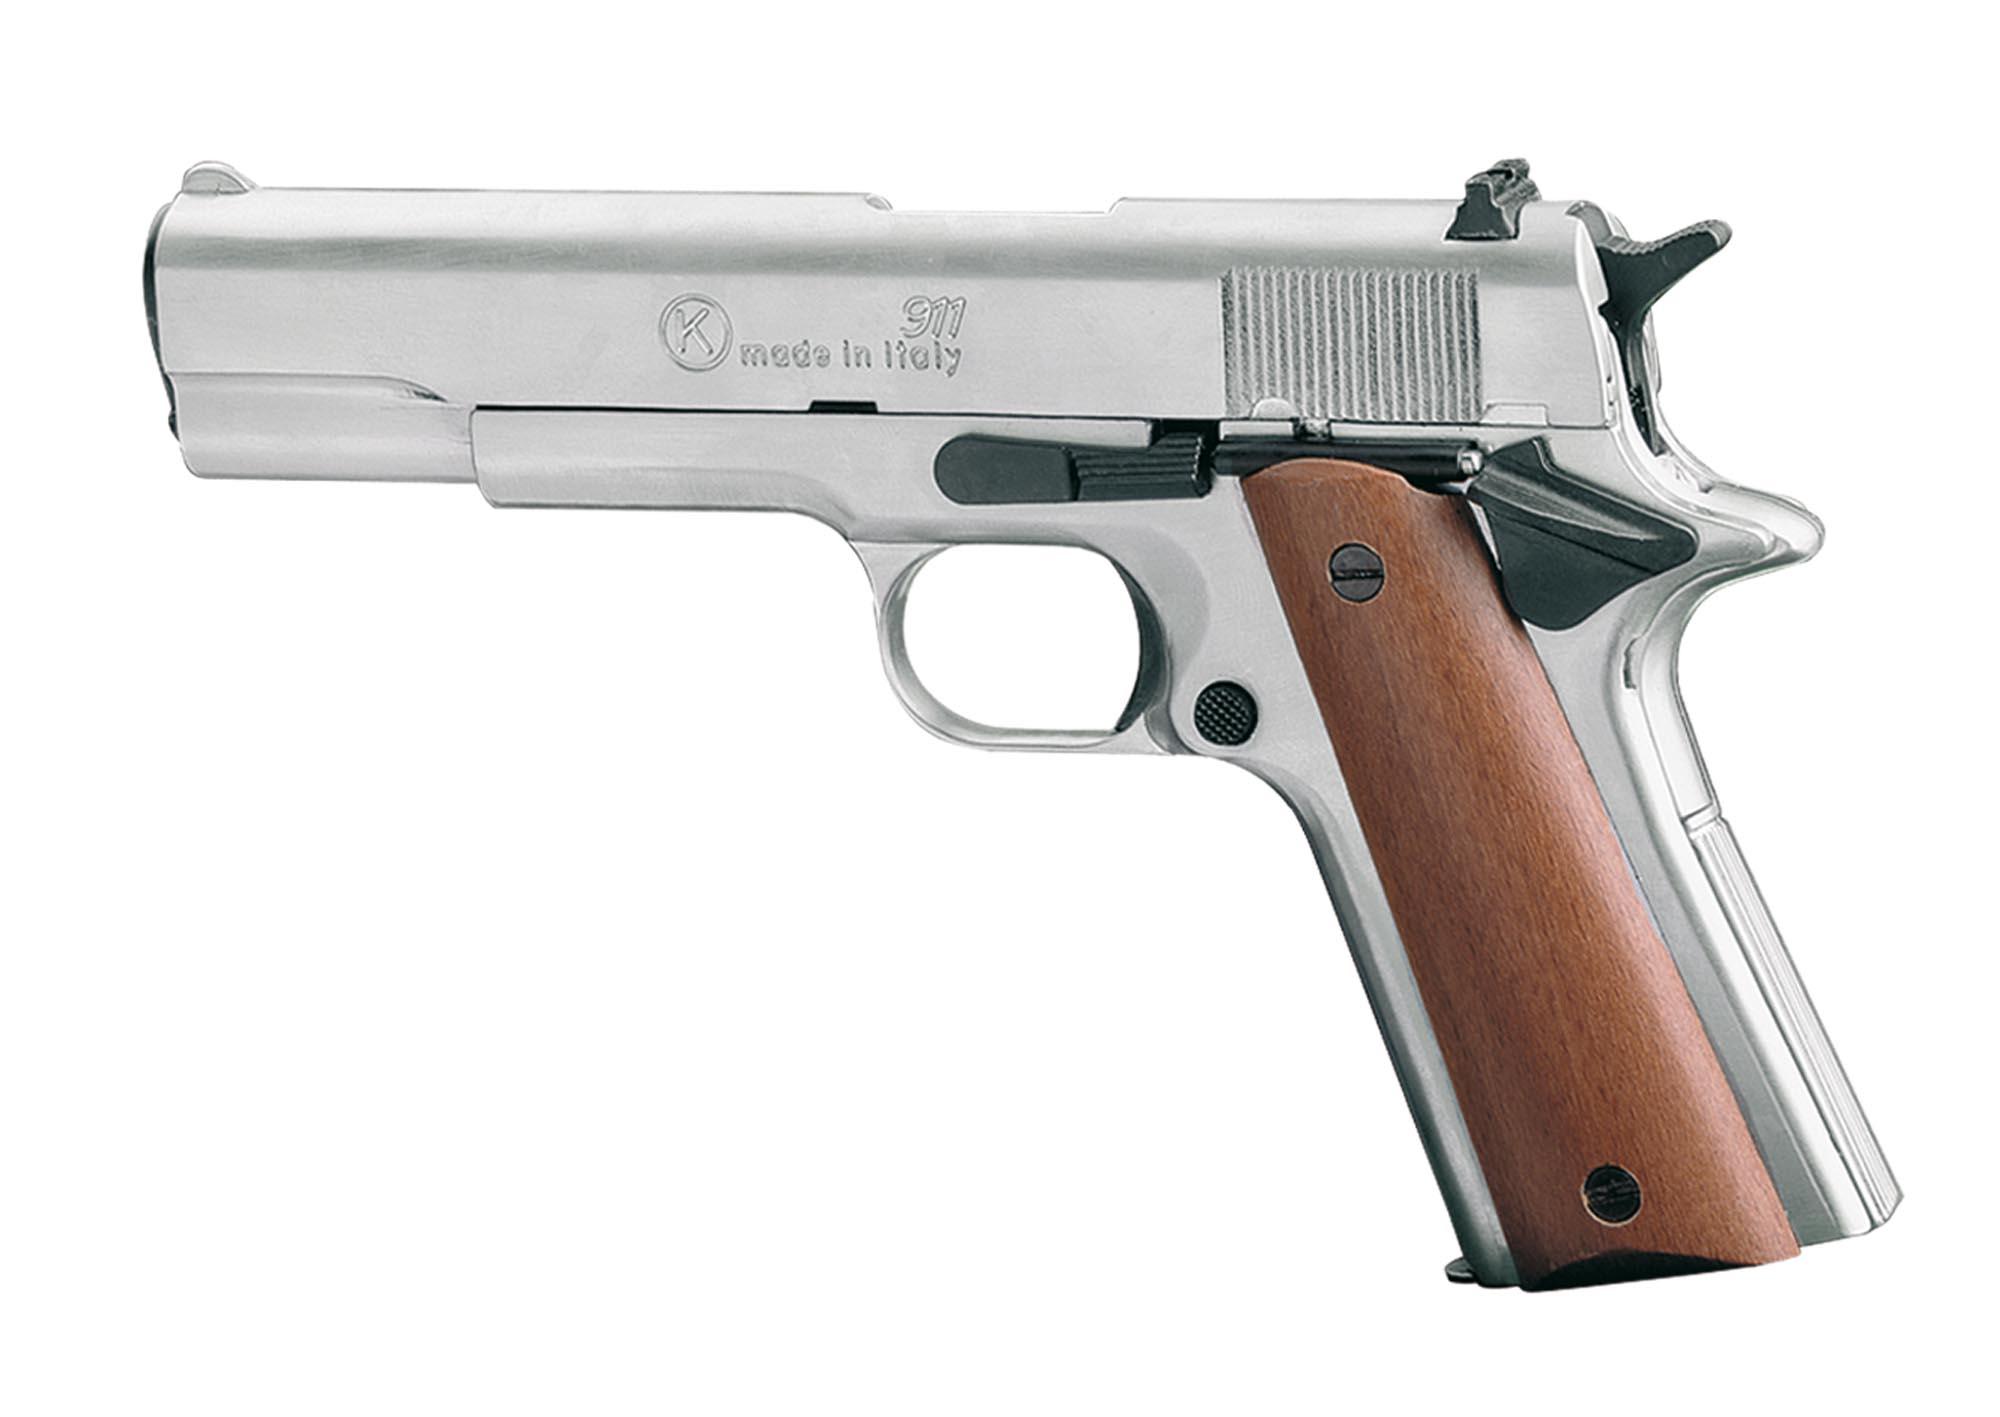 eaab221 chiappa pistolet 9 mm blanc 911 nickel chiappa. Black Bedroom Furniture Sets. Home Design Ideas